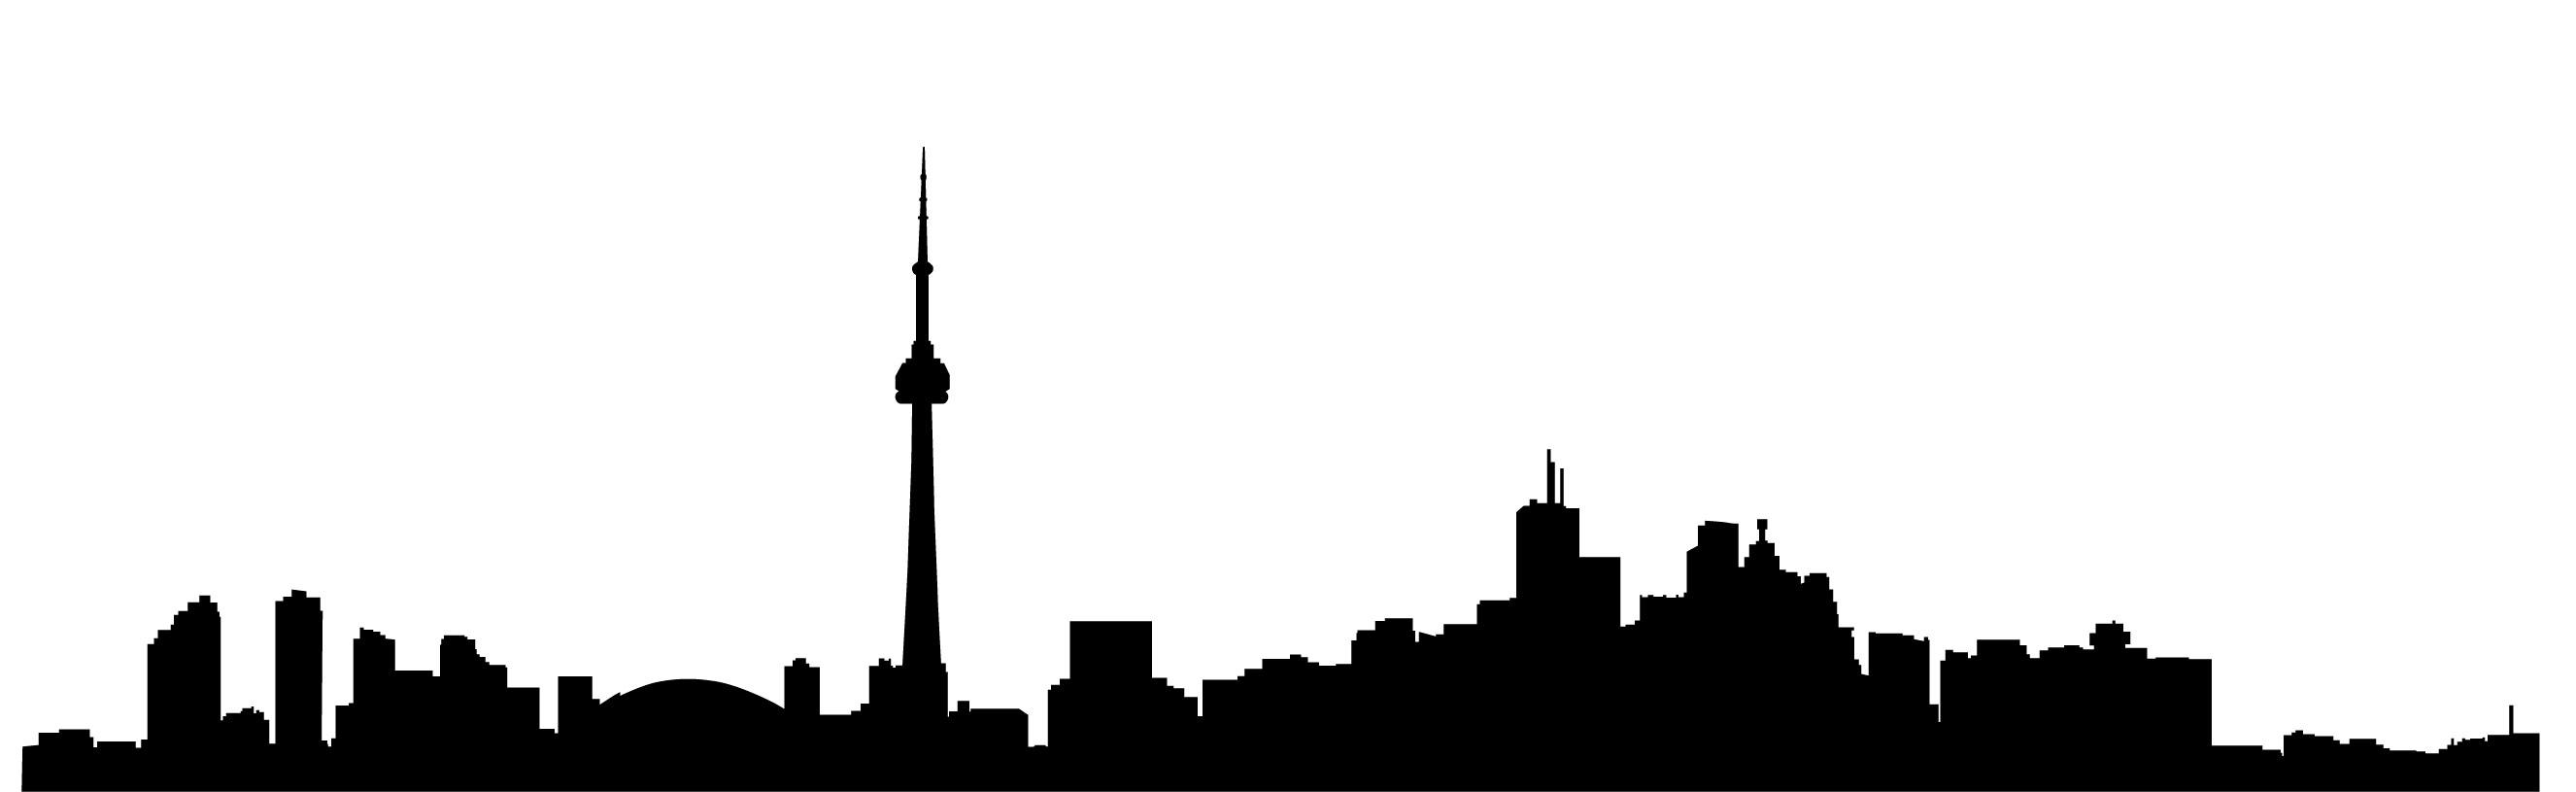 2652x815 In Toronto